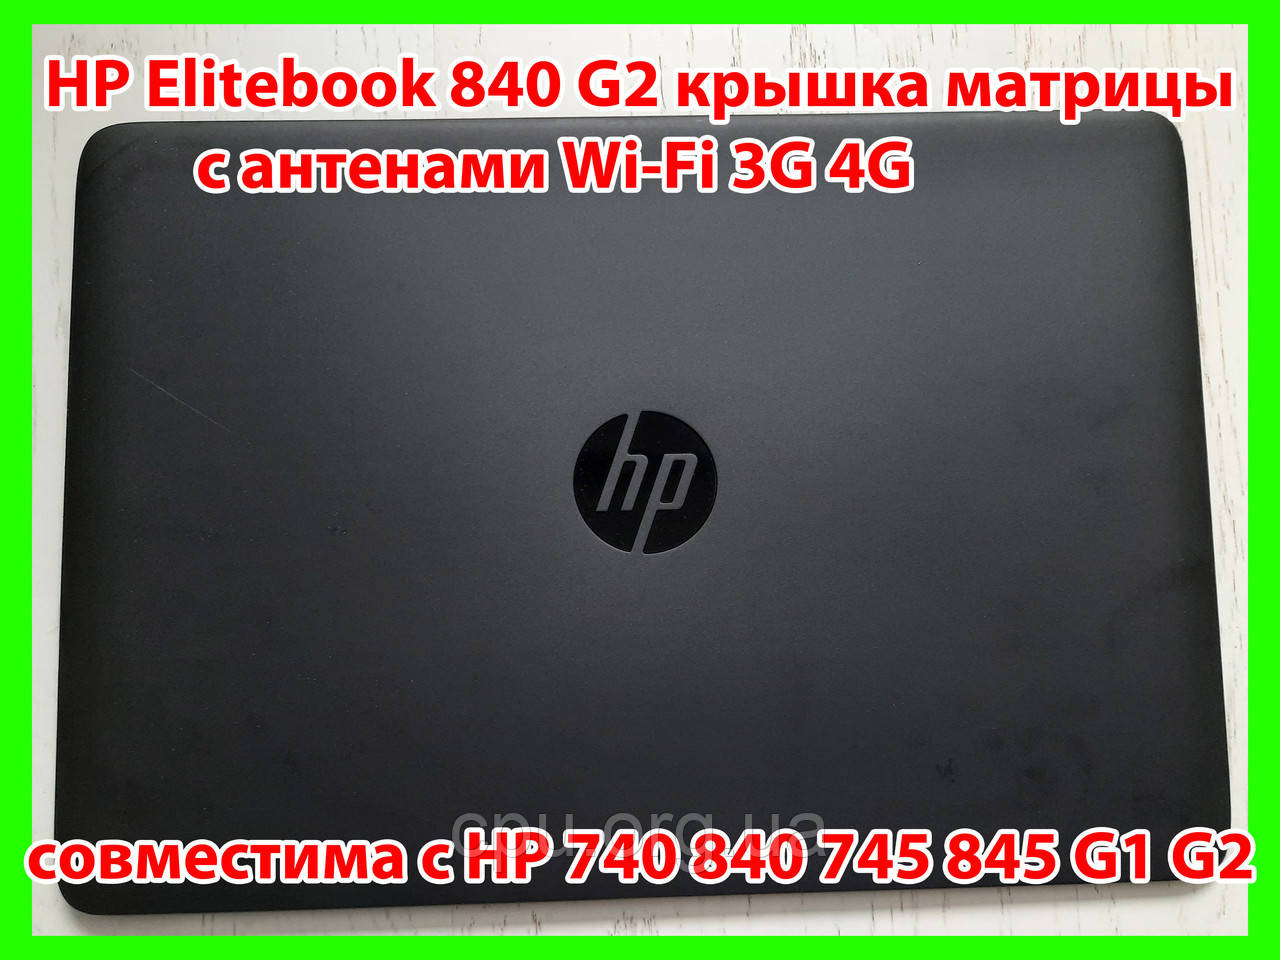 Кришка матриці з антенами wifi 3g 4g HP Elitebook 840 G2 779682-001 ( 840 845 740 745 G1 G2)